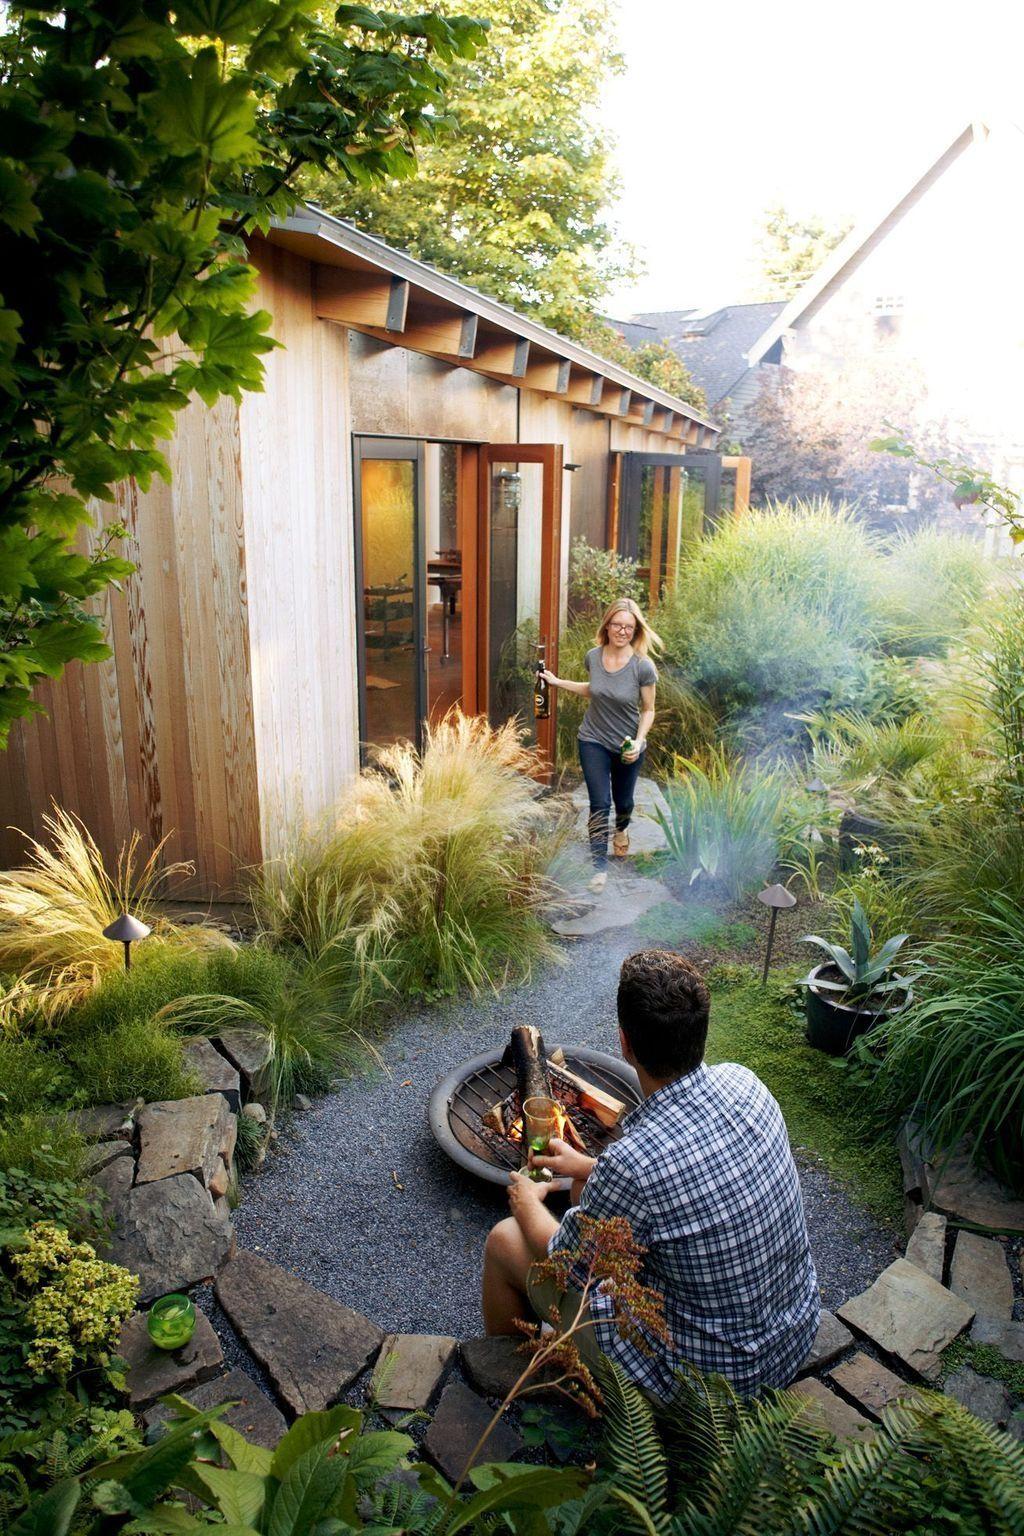 46 Inspiring Backyard Shed Ideas To Maximize Your Garden Space Cottage Garden Backyard Landscaping Backyard Backyard landscaping ideas with sheds